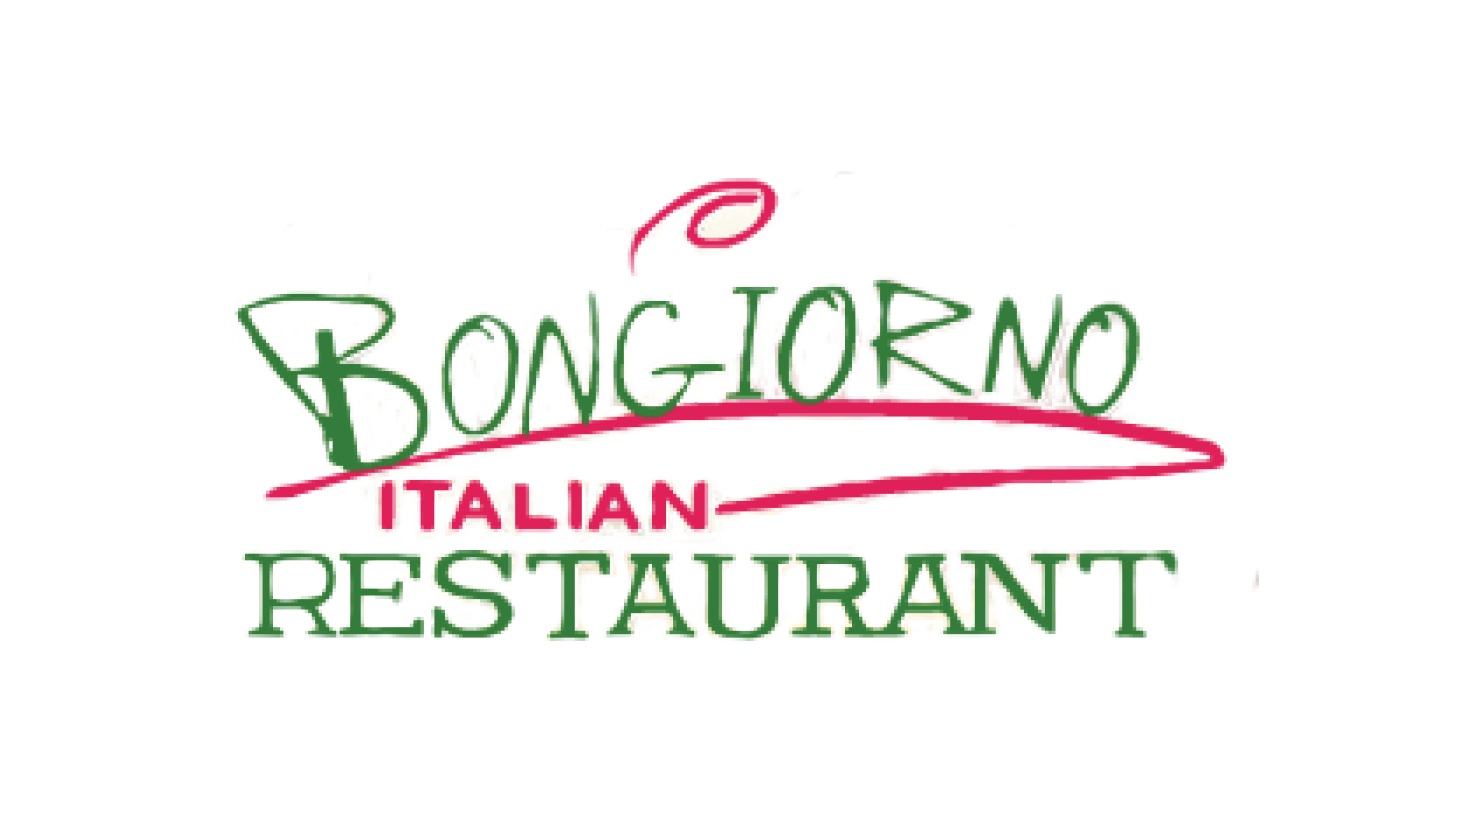 Bongiorno Italian Restaurant 001.png